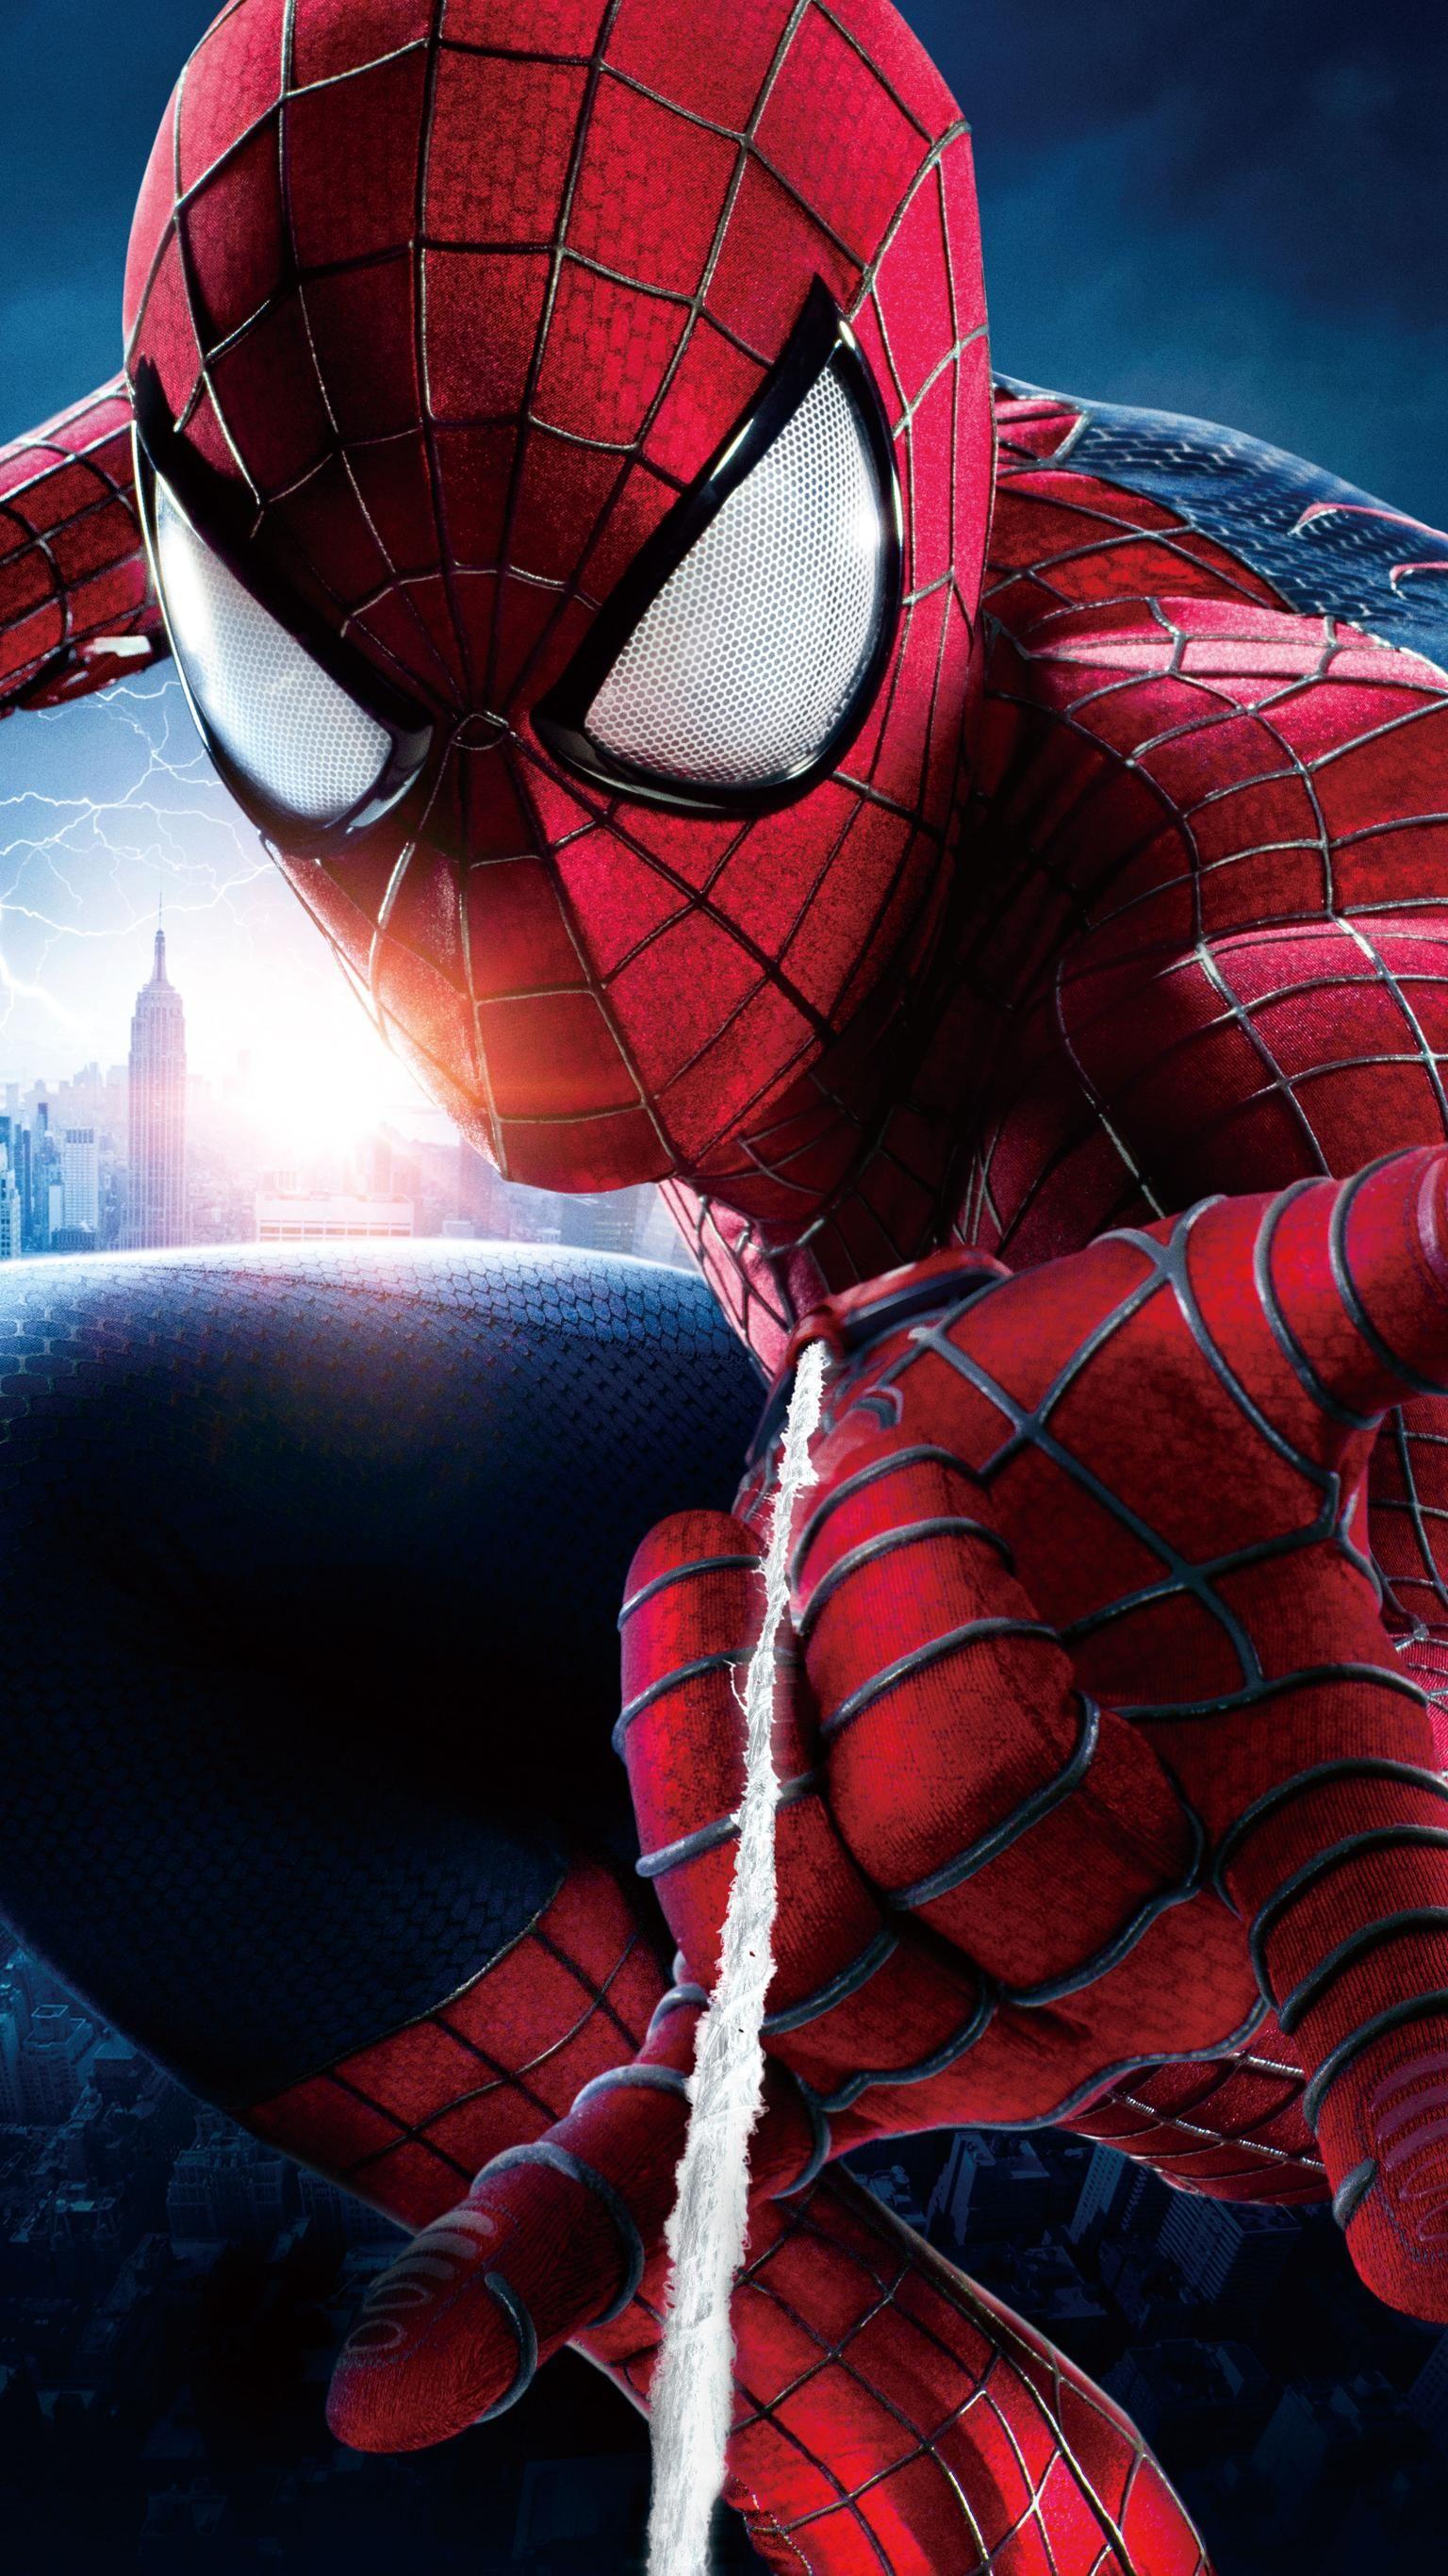 The Amazing Spider Man 2 2014 Phone Wallpaper Moviemania Spiderman Amazing Spiderman Spiderman Comic The amazing spider man 2 wallpaper for